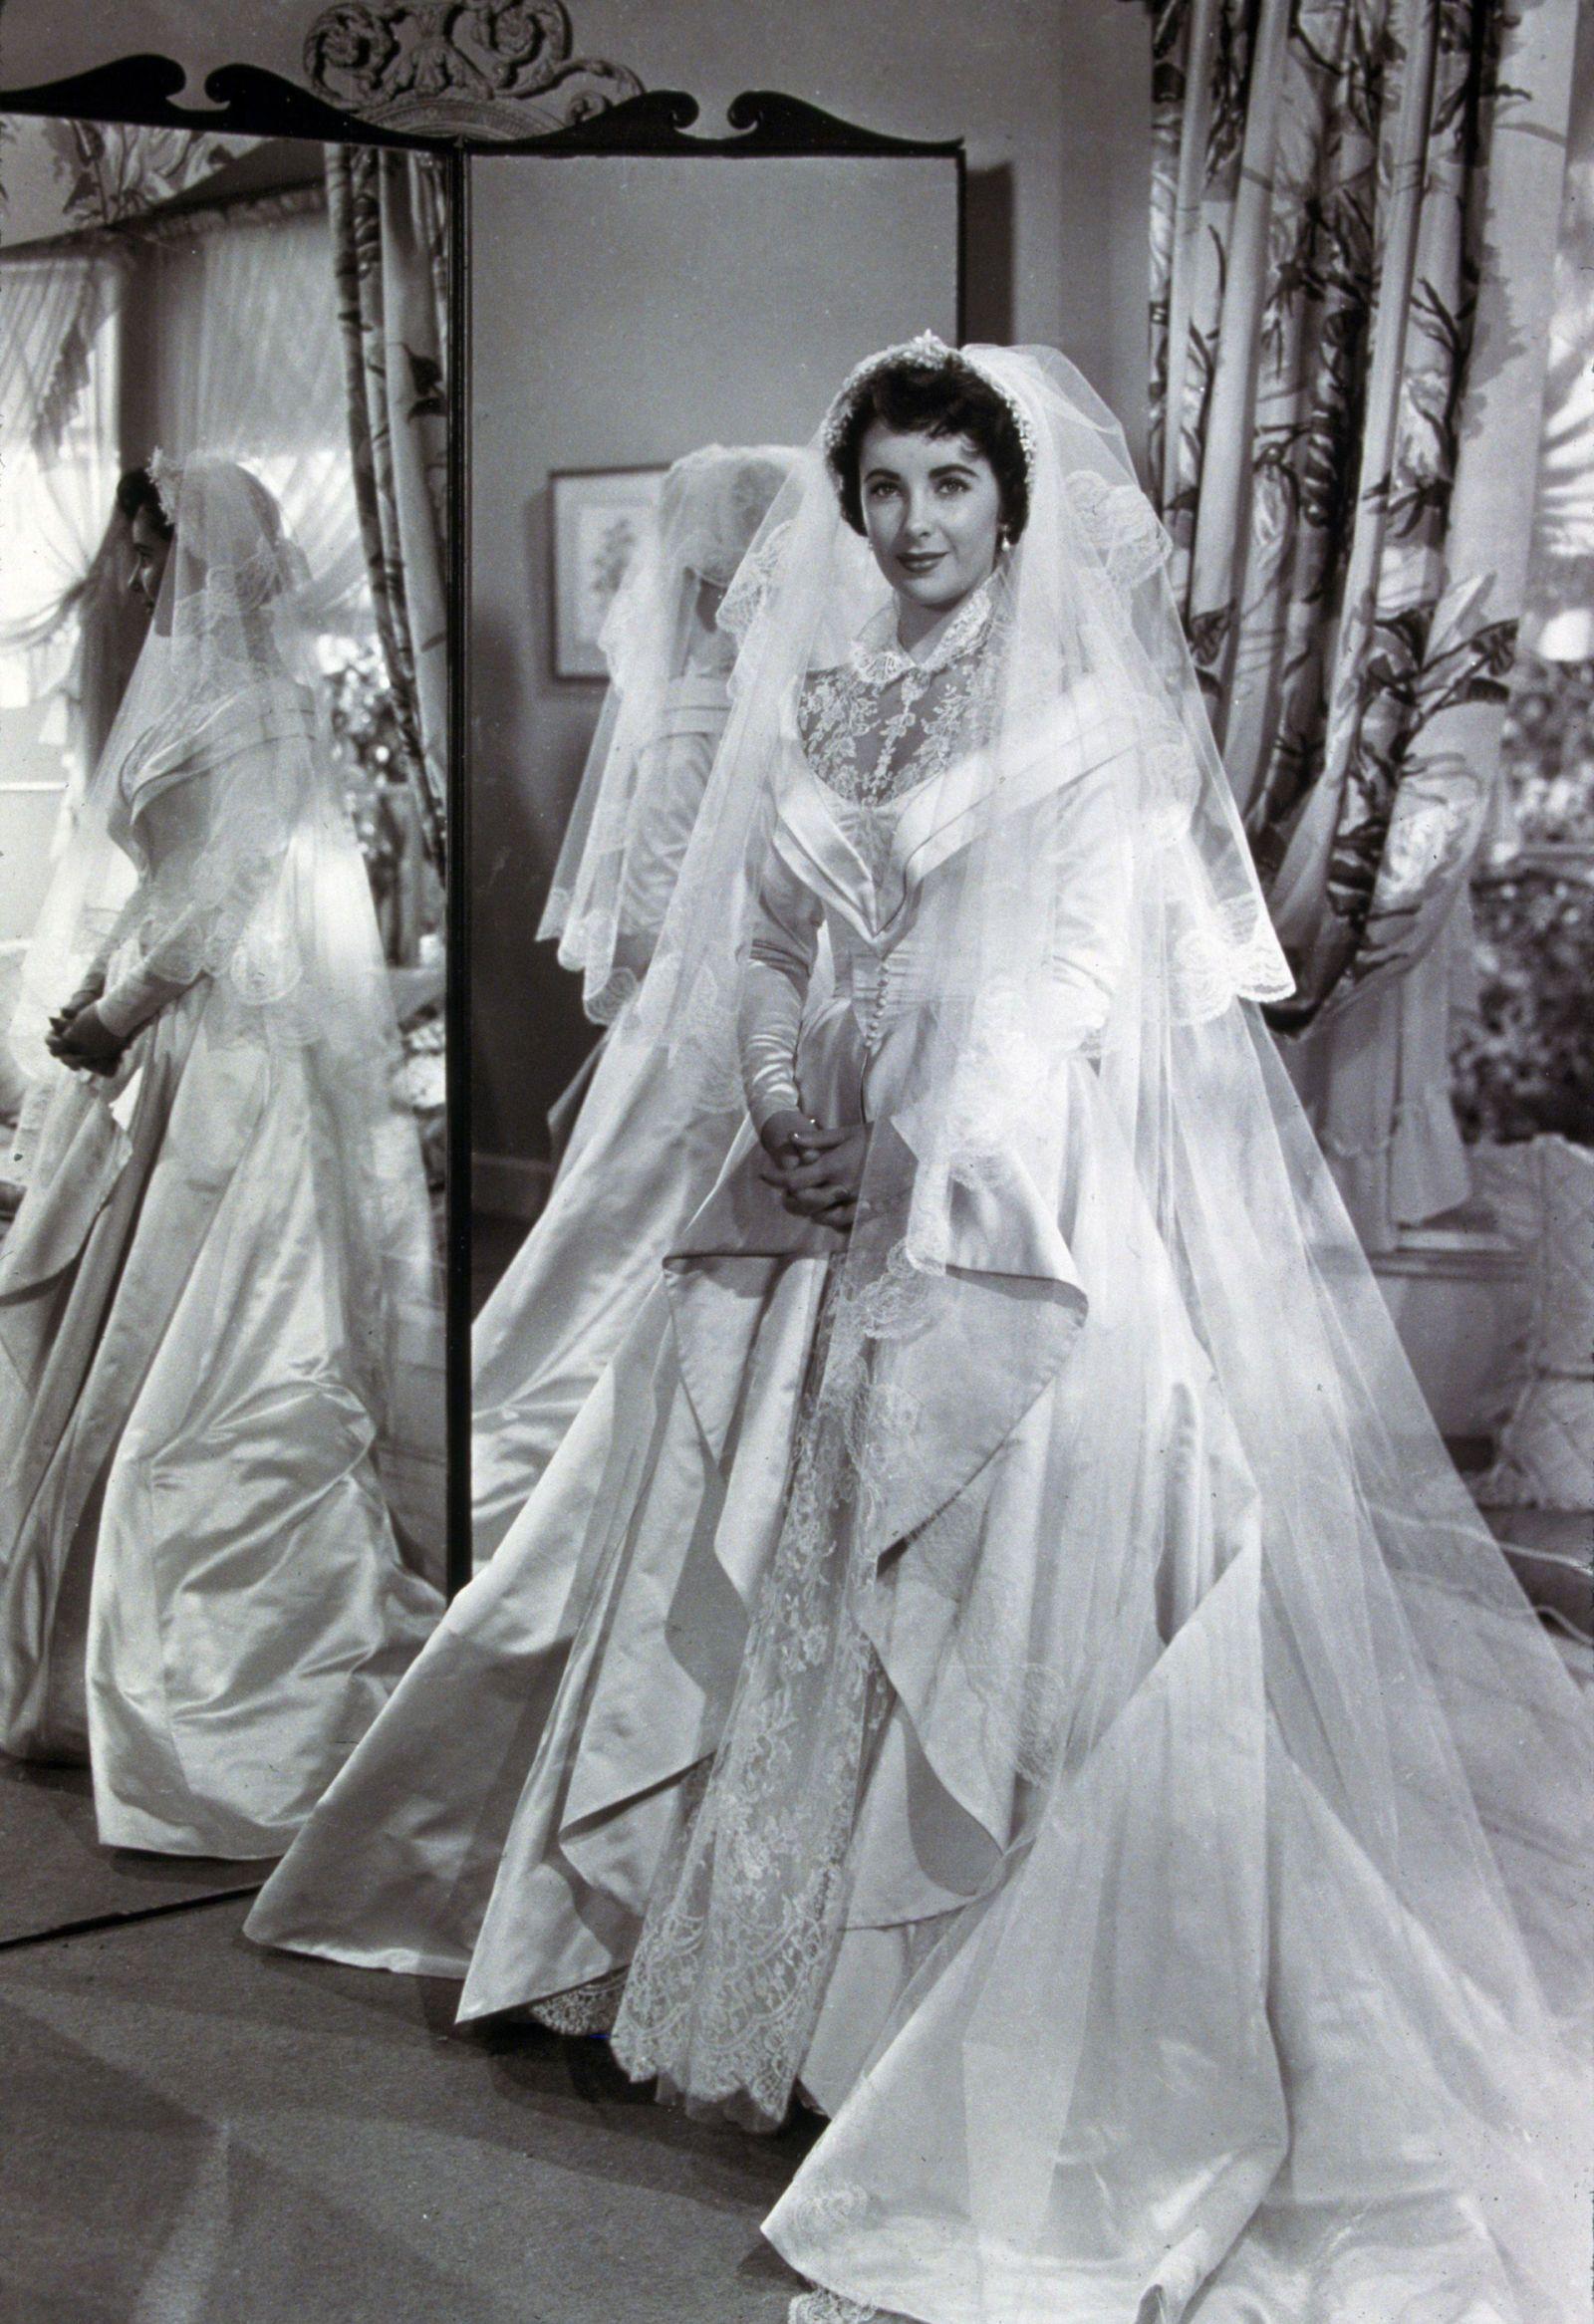 8d421798c2ee7 Famous Wedding Dresses - Wedding Dresses Through the Years